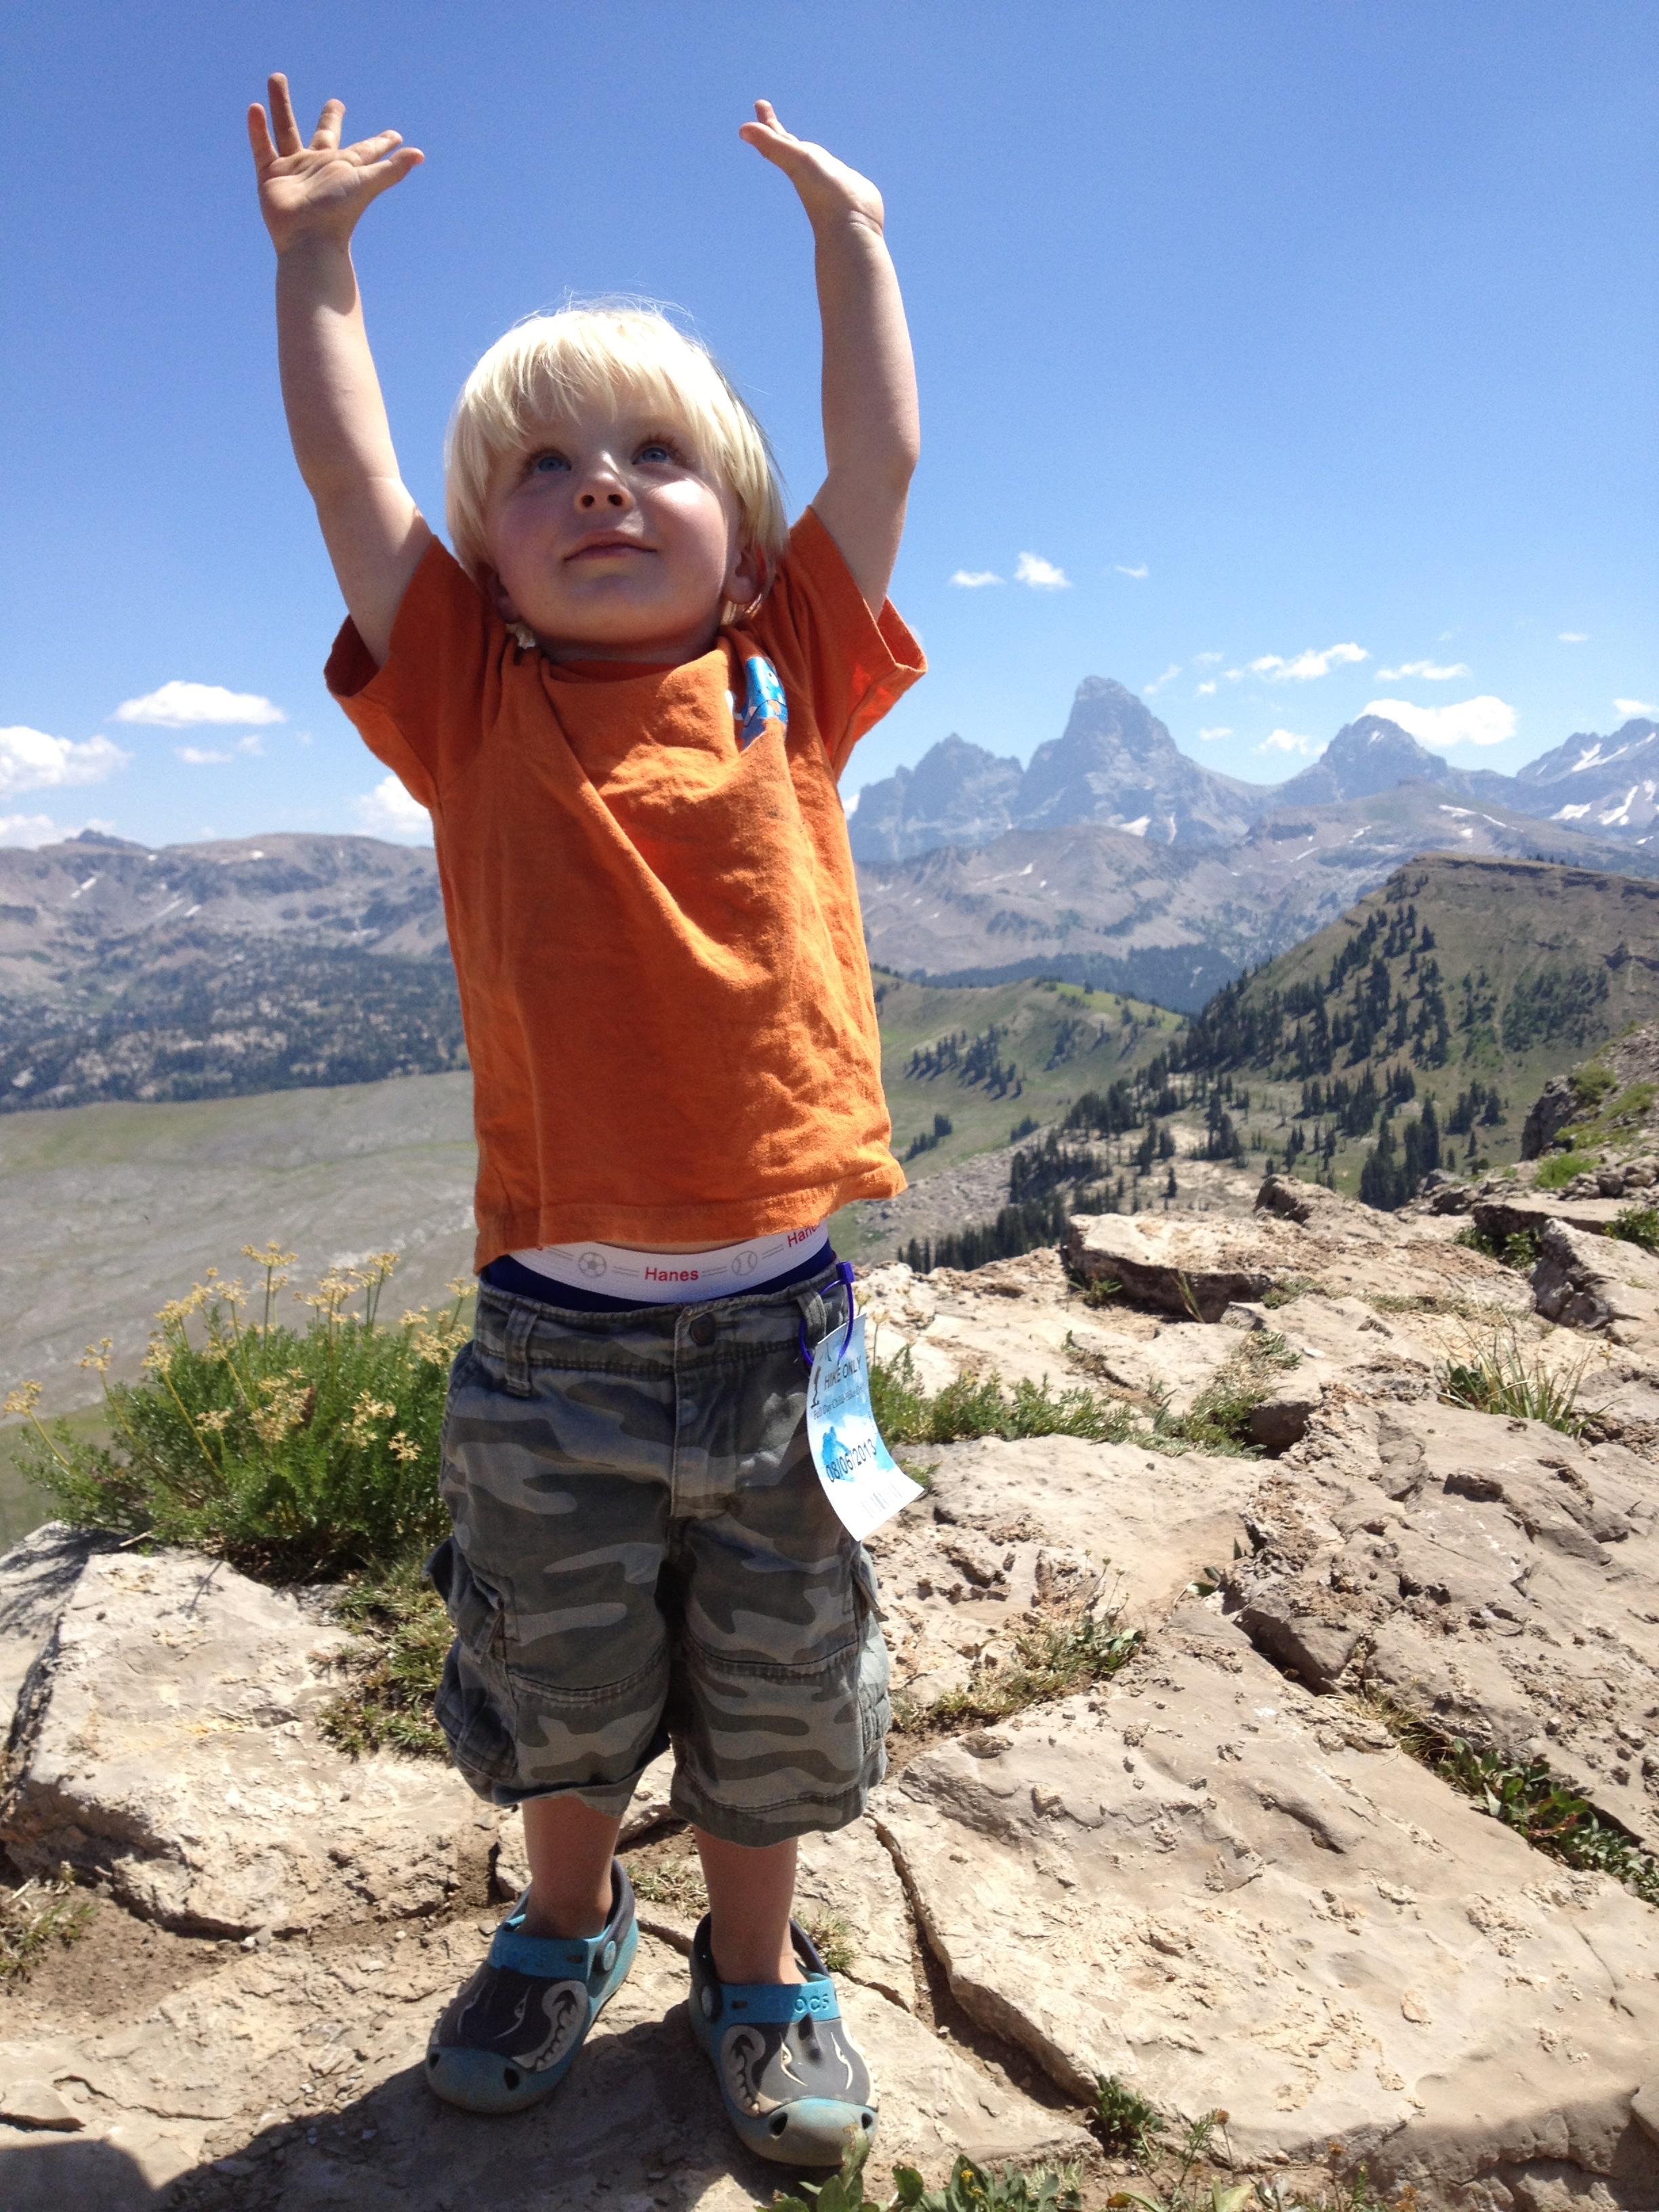 It's easy to overlook my children's uniqueness, as it is God's vastness.